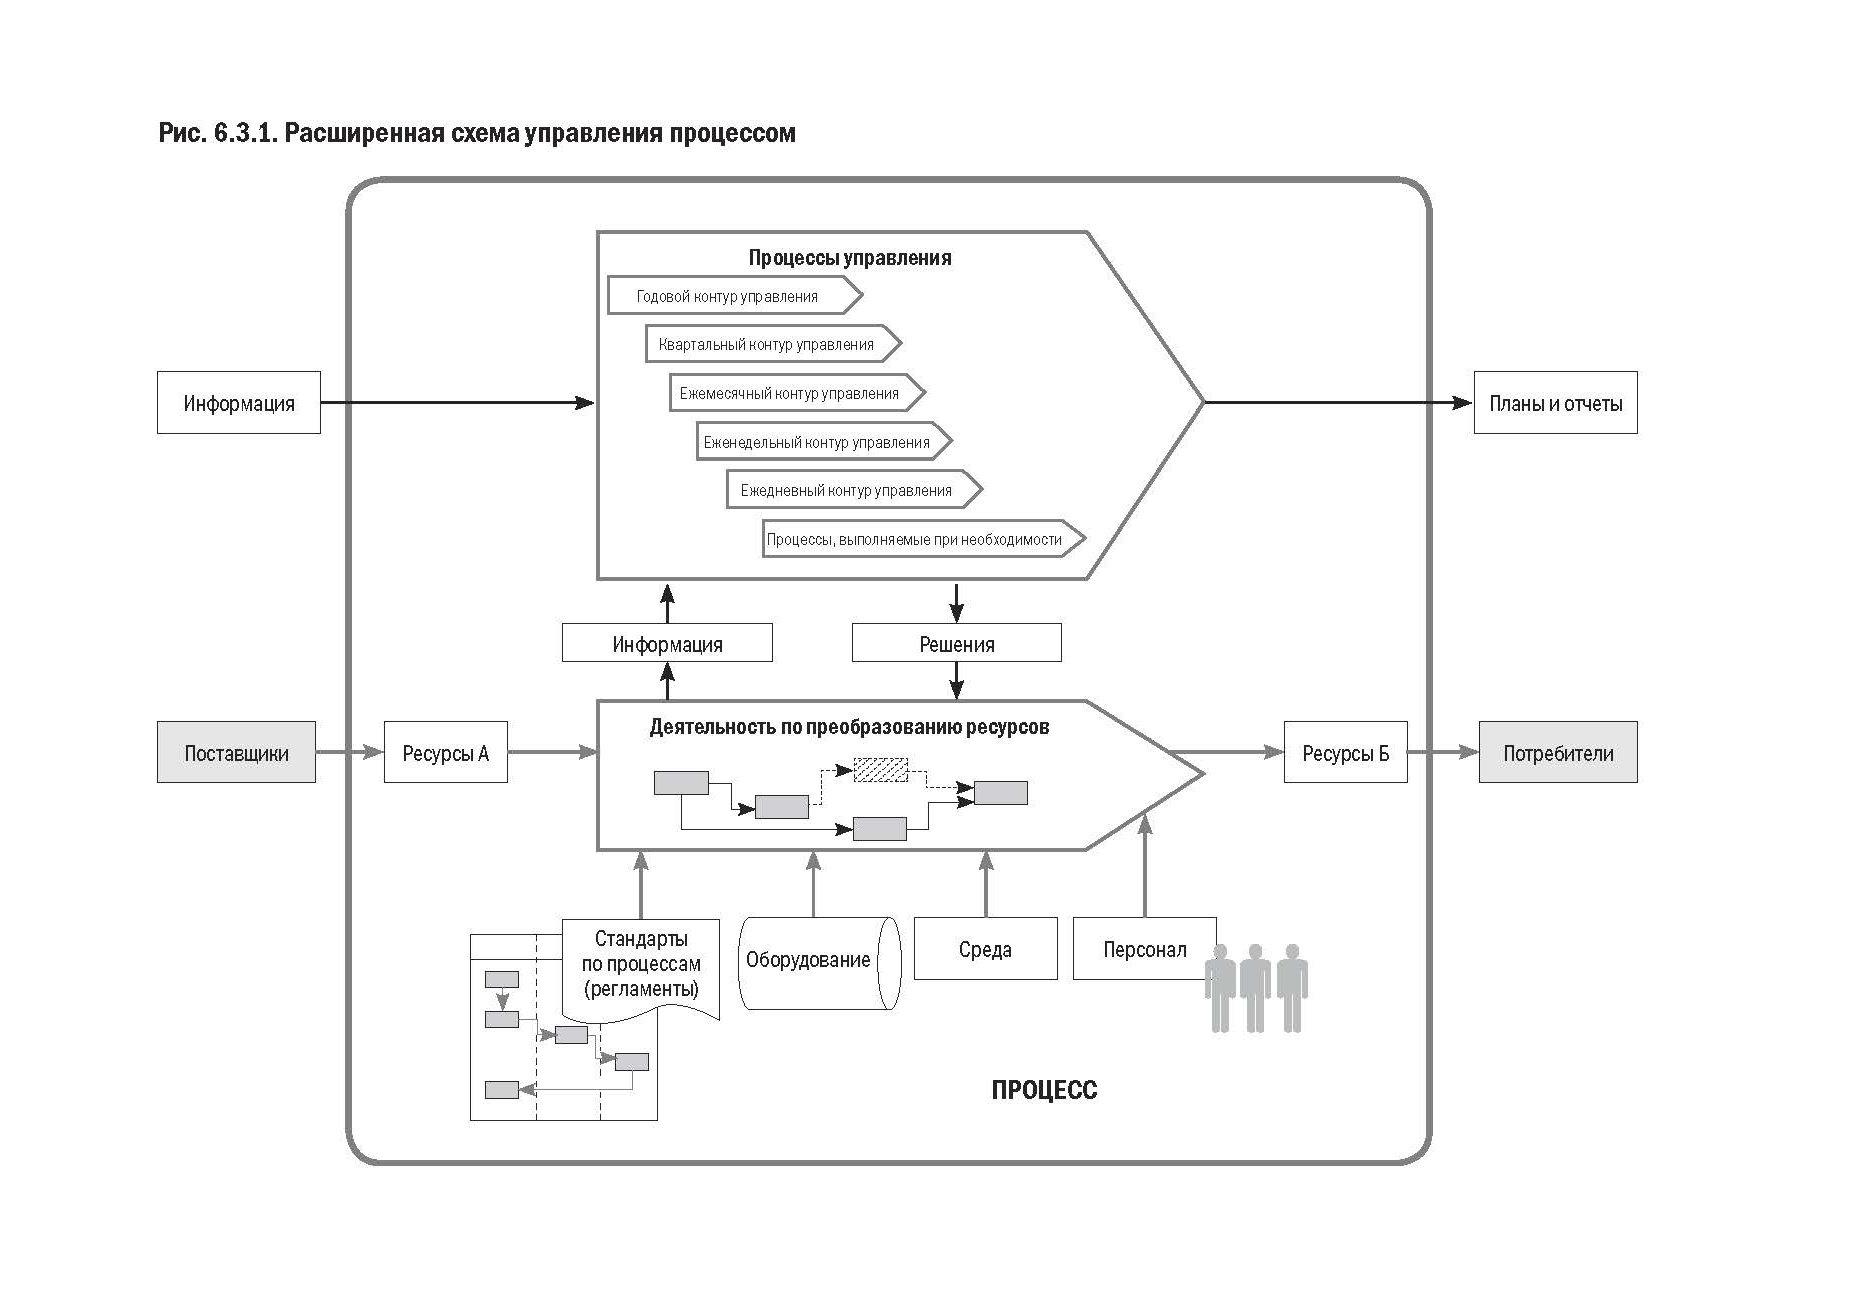 Хаммер чампи реинжиниринг корпорации скачать pdf